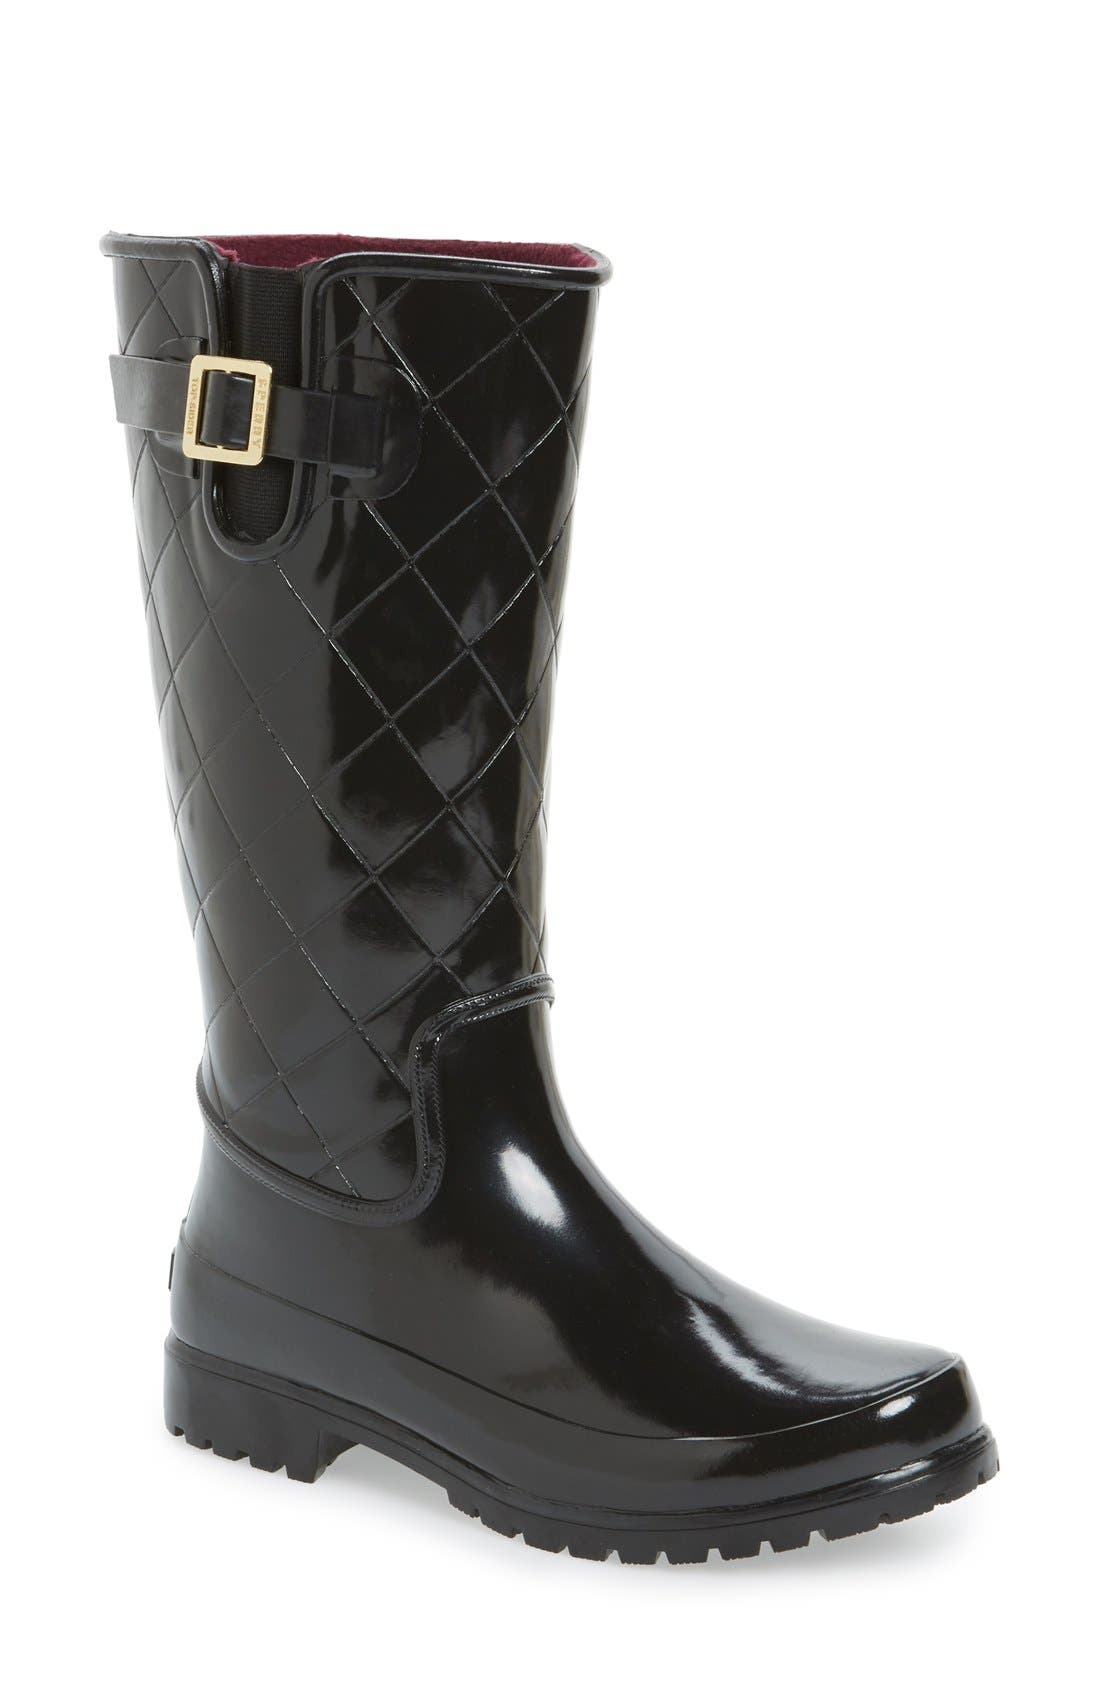 Main Image - Sperry Top-Sider® 'Pelican' Tall Rain Boot (Women)